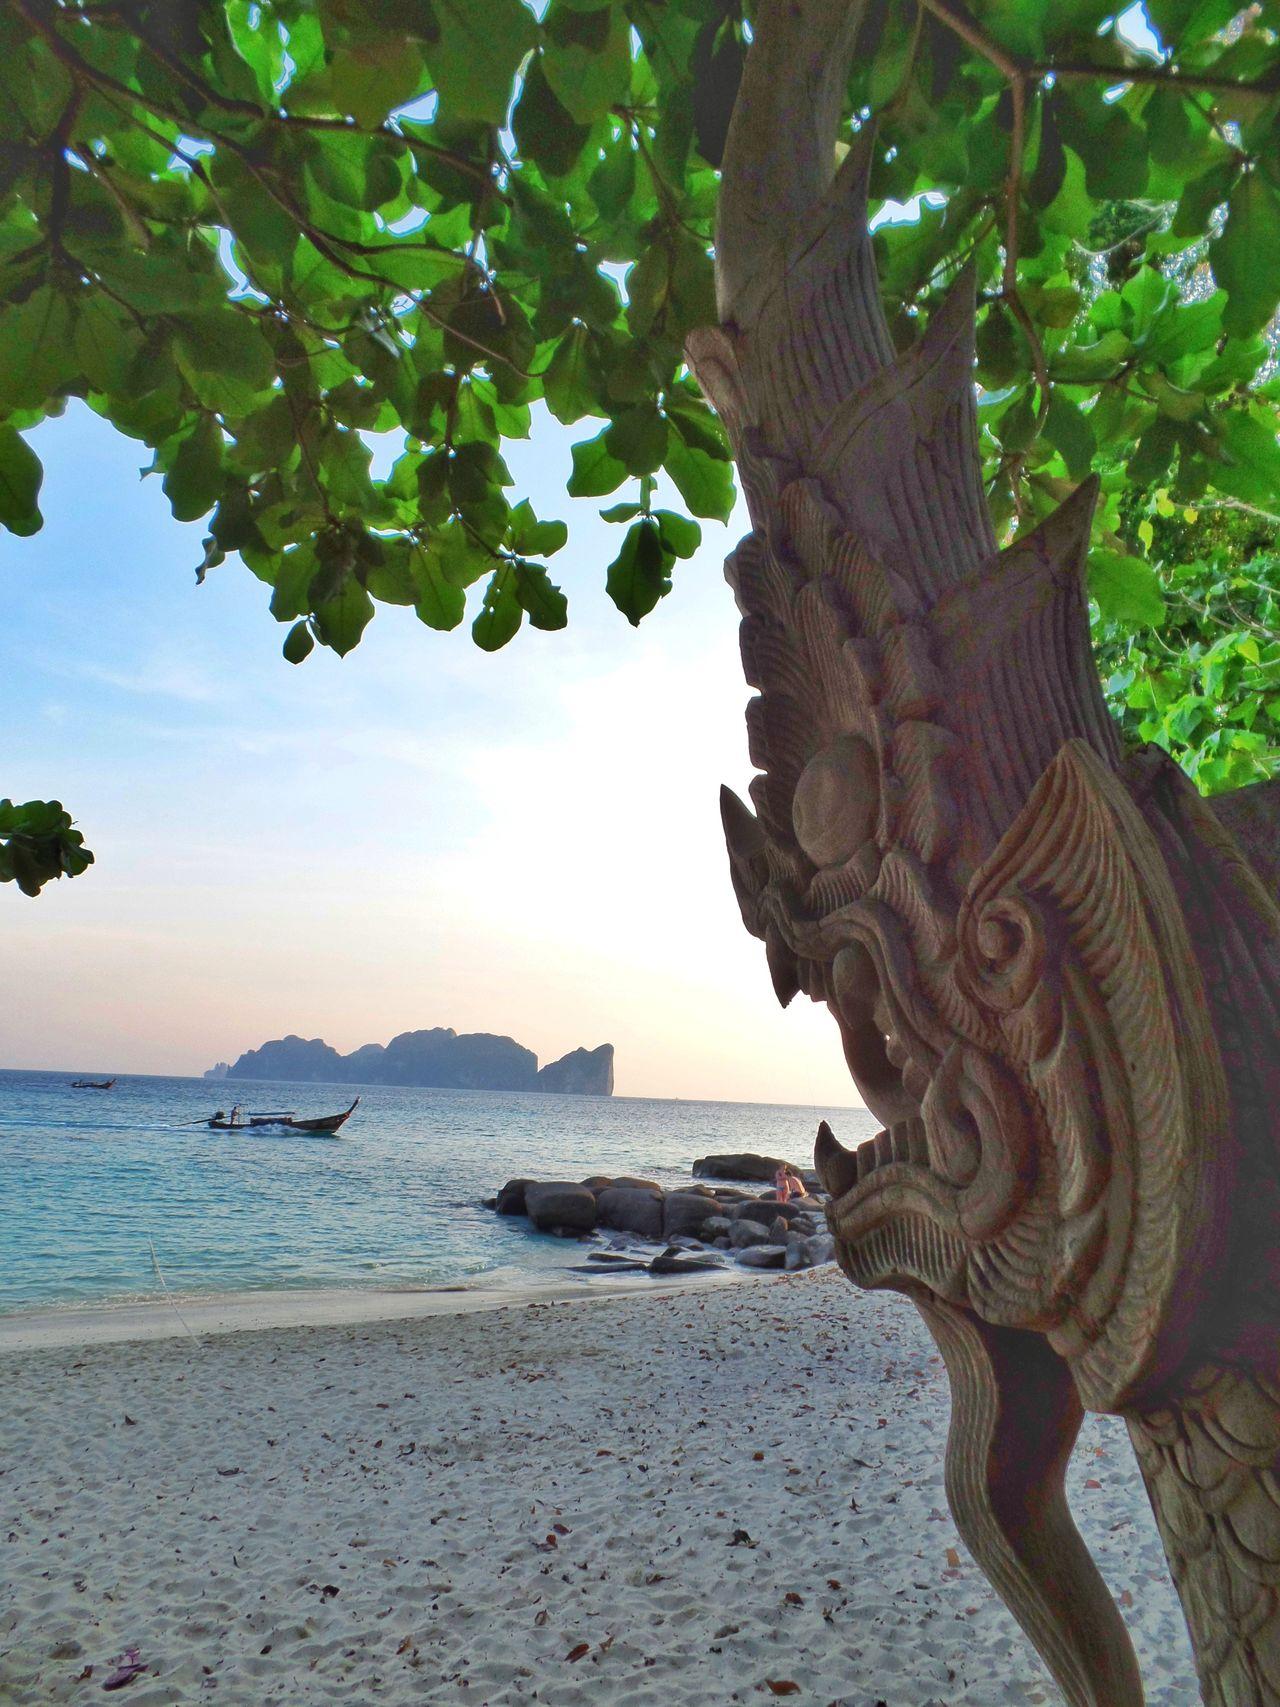 Nature Sea Water Day Beach long beach Thailand phiphi island Travel Destinations Arte art Outdoors The Great Outdoors - 2017 EyeEm Awards